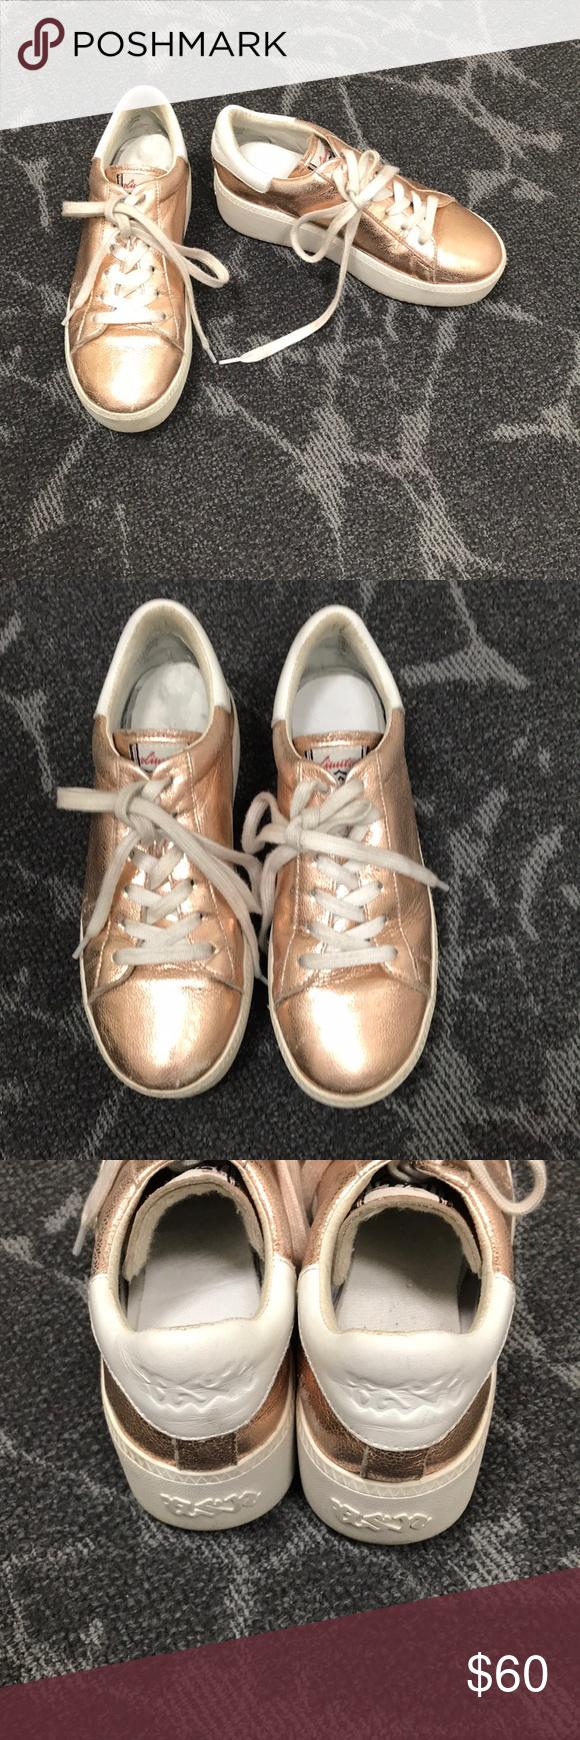 54b2e5b12ab4 Ash sneakers Cute rose gold platform sneakers Ash Shoes Platforms ...